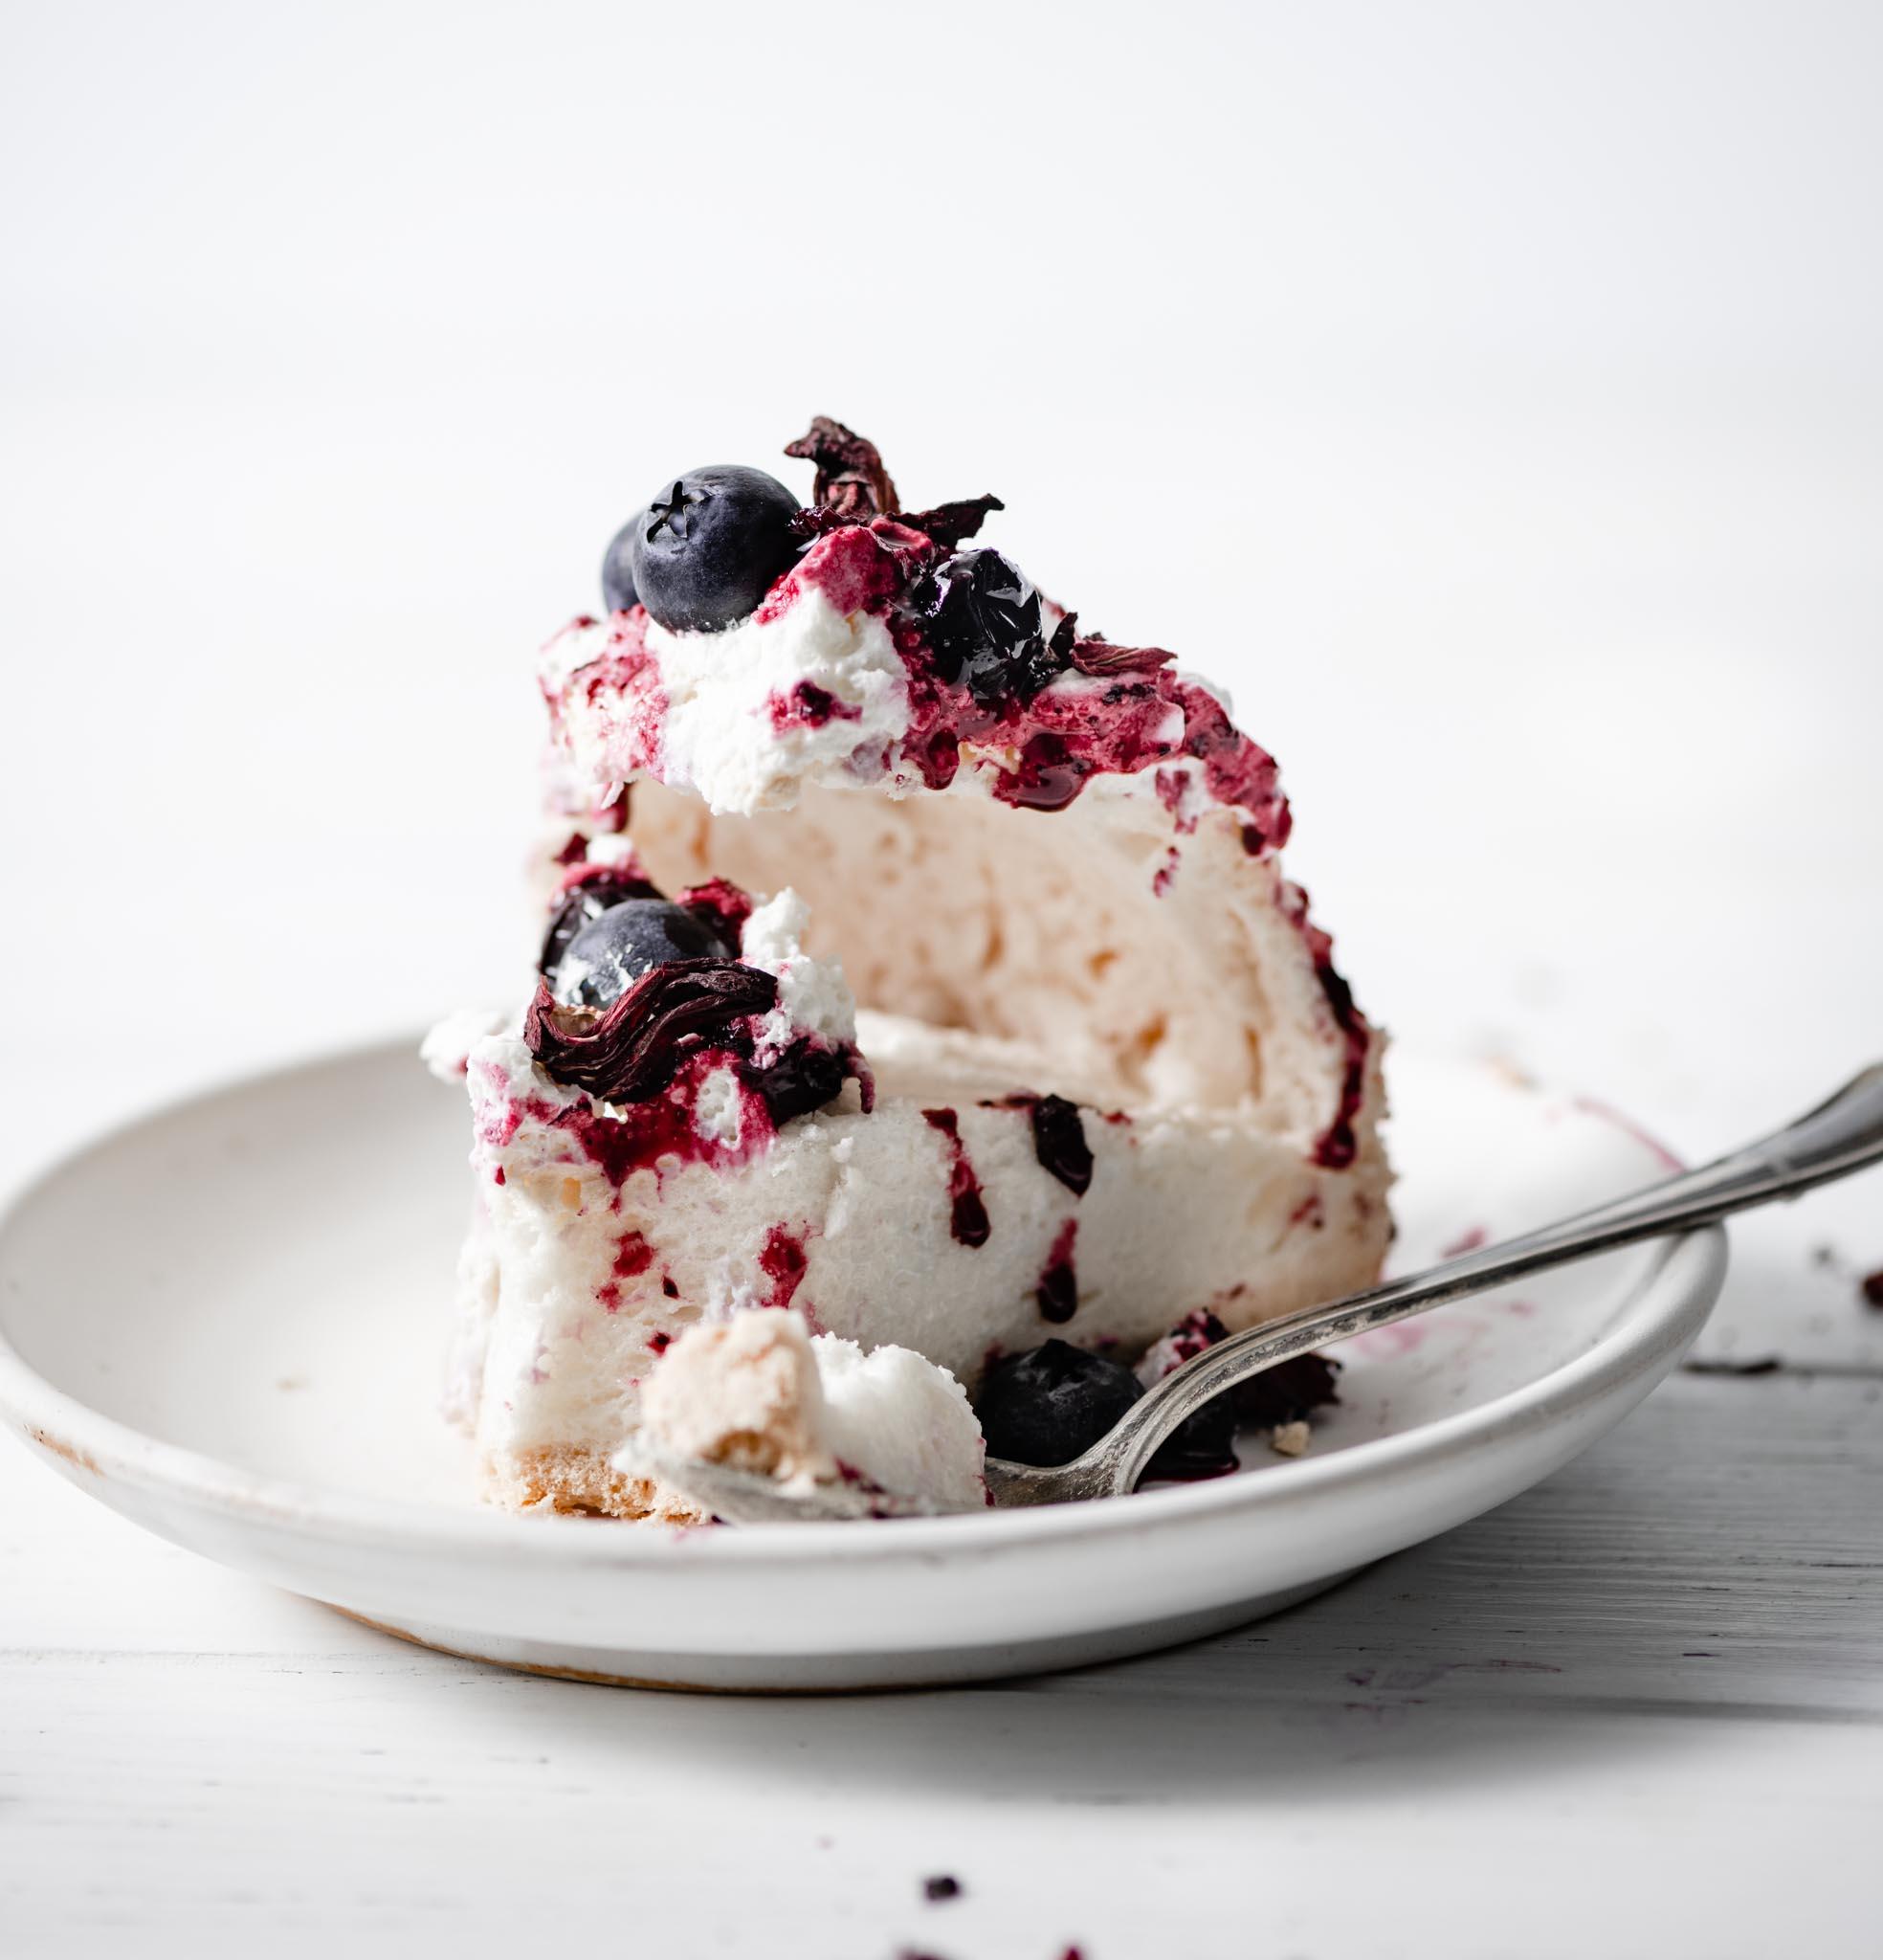 Sliced blueberry compote pavlova cake.